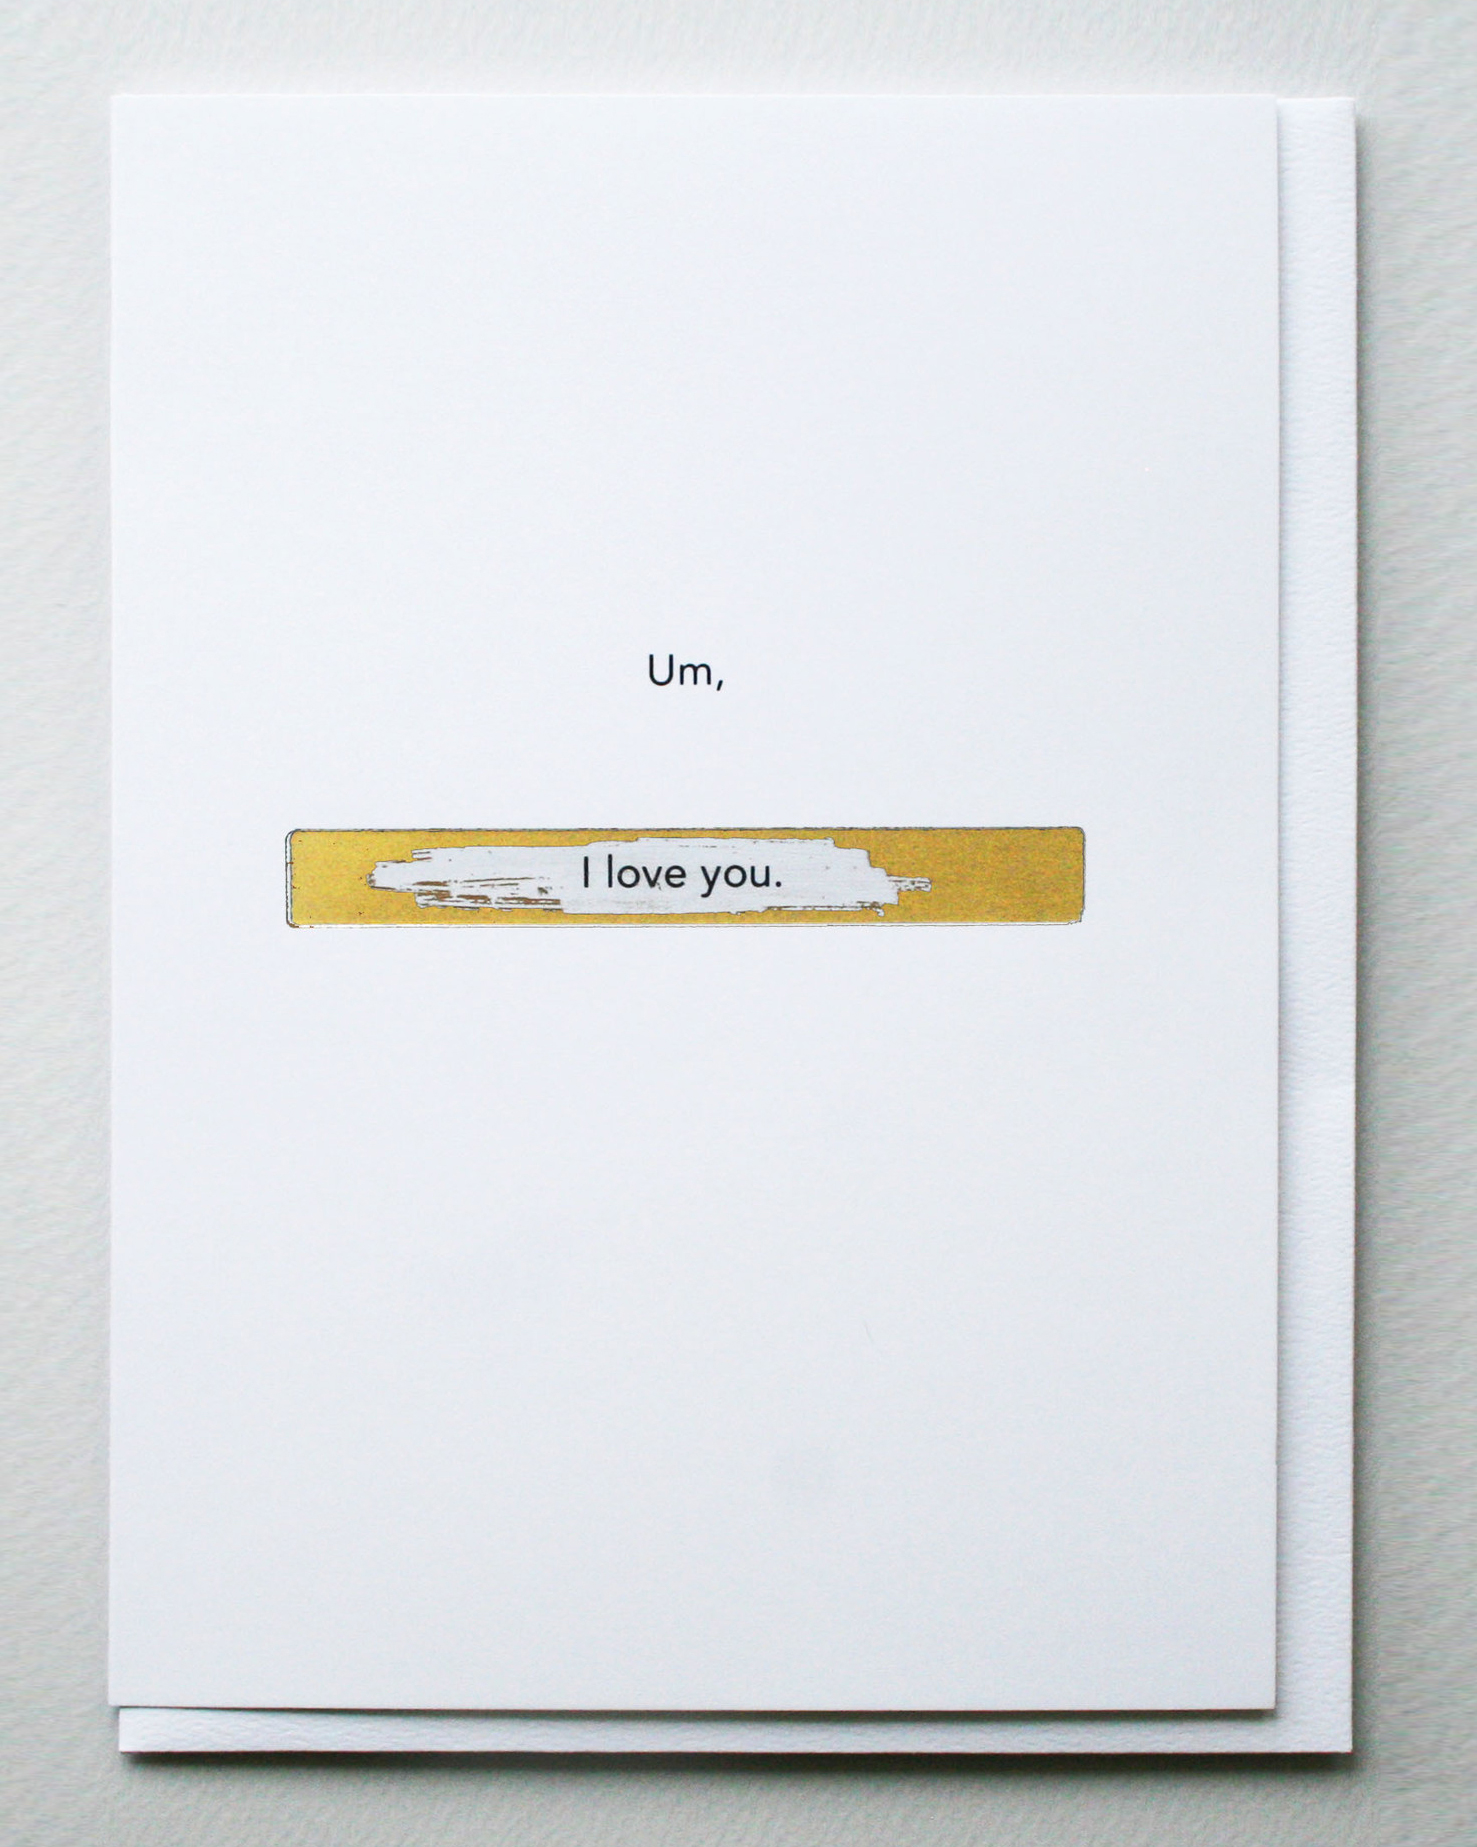 valentines-card-scratch-off-0115.jpg